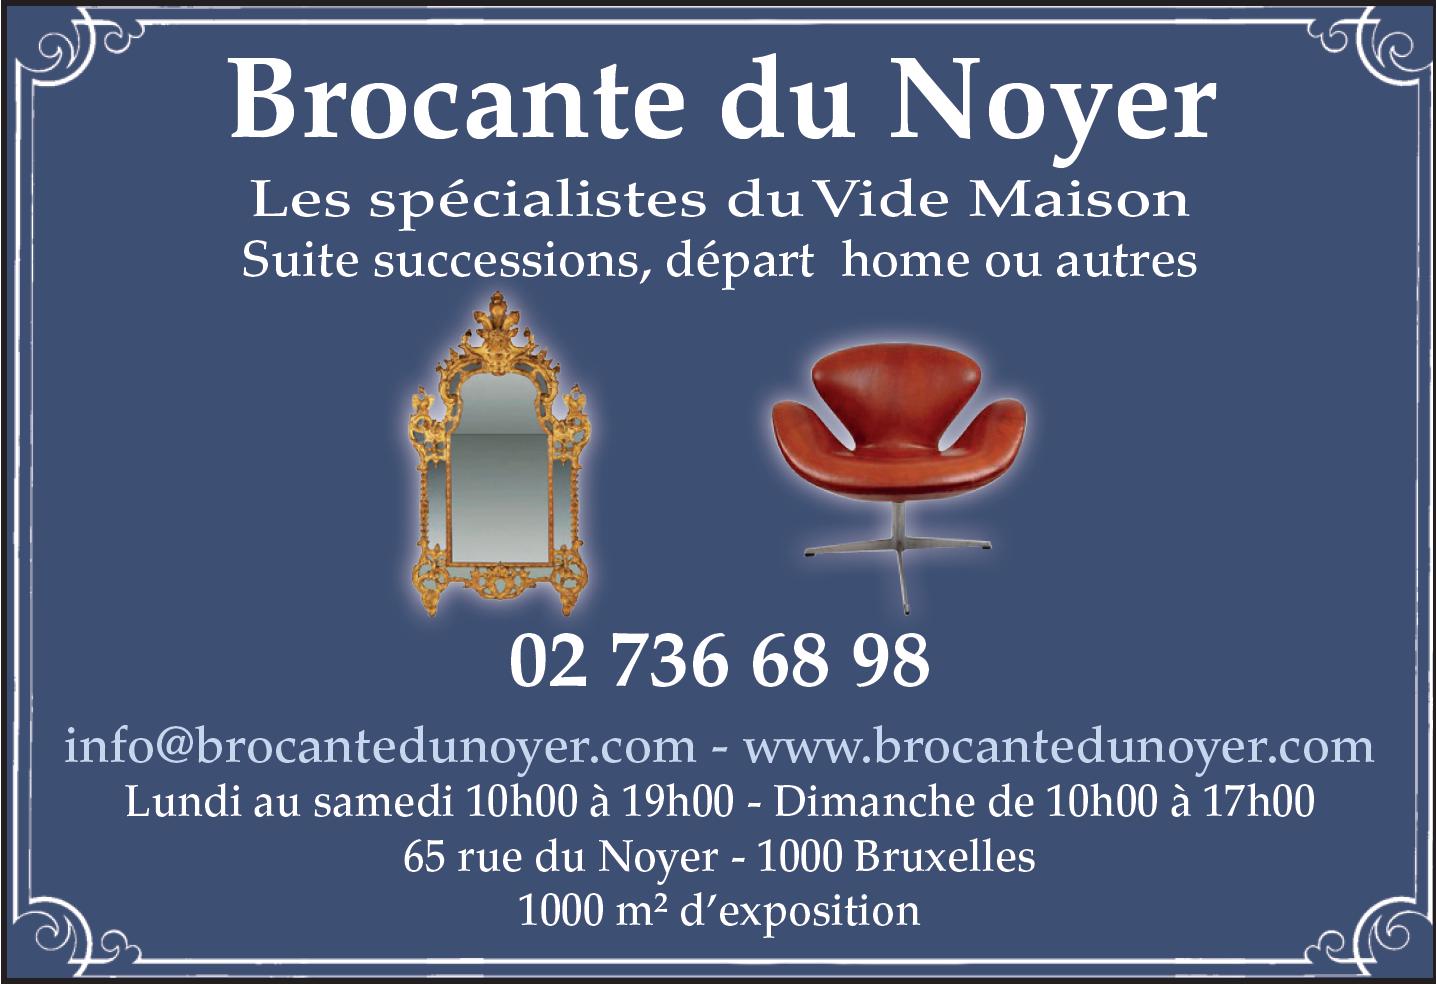 Brocante Du Noyer